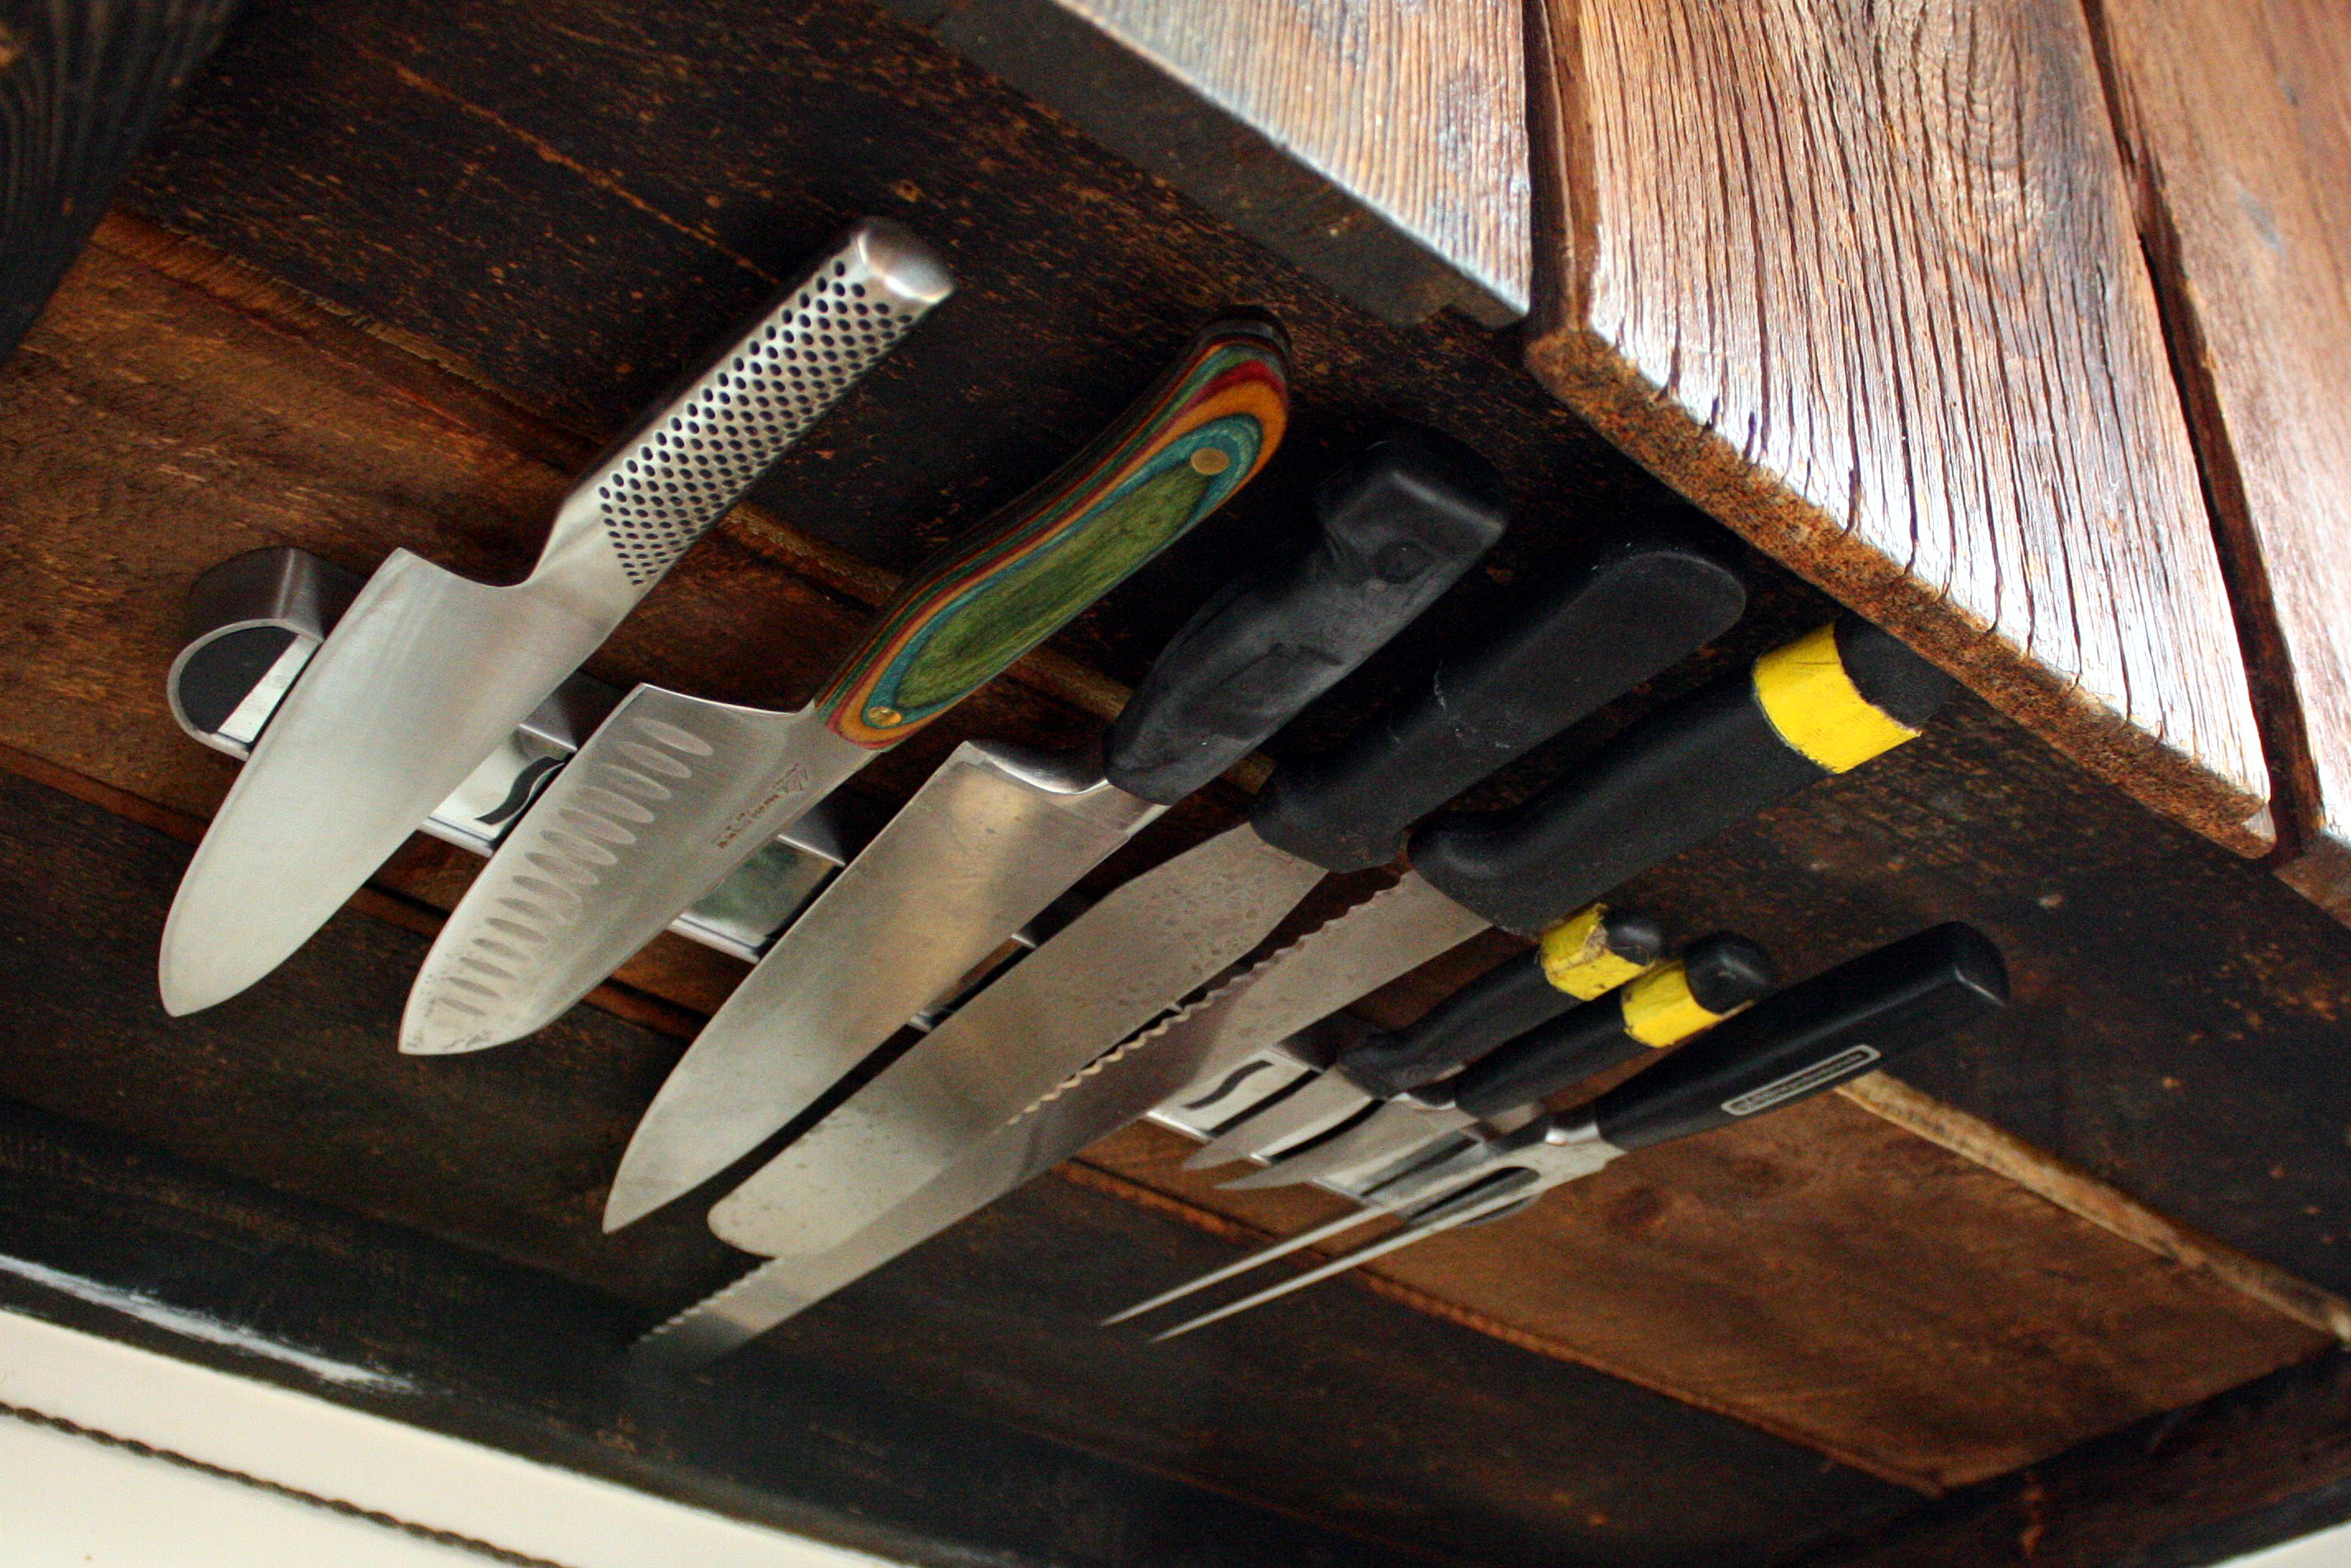 Plans to build Under Cabinet Drop Down Knife Storage PDF Plans